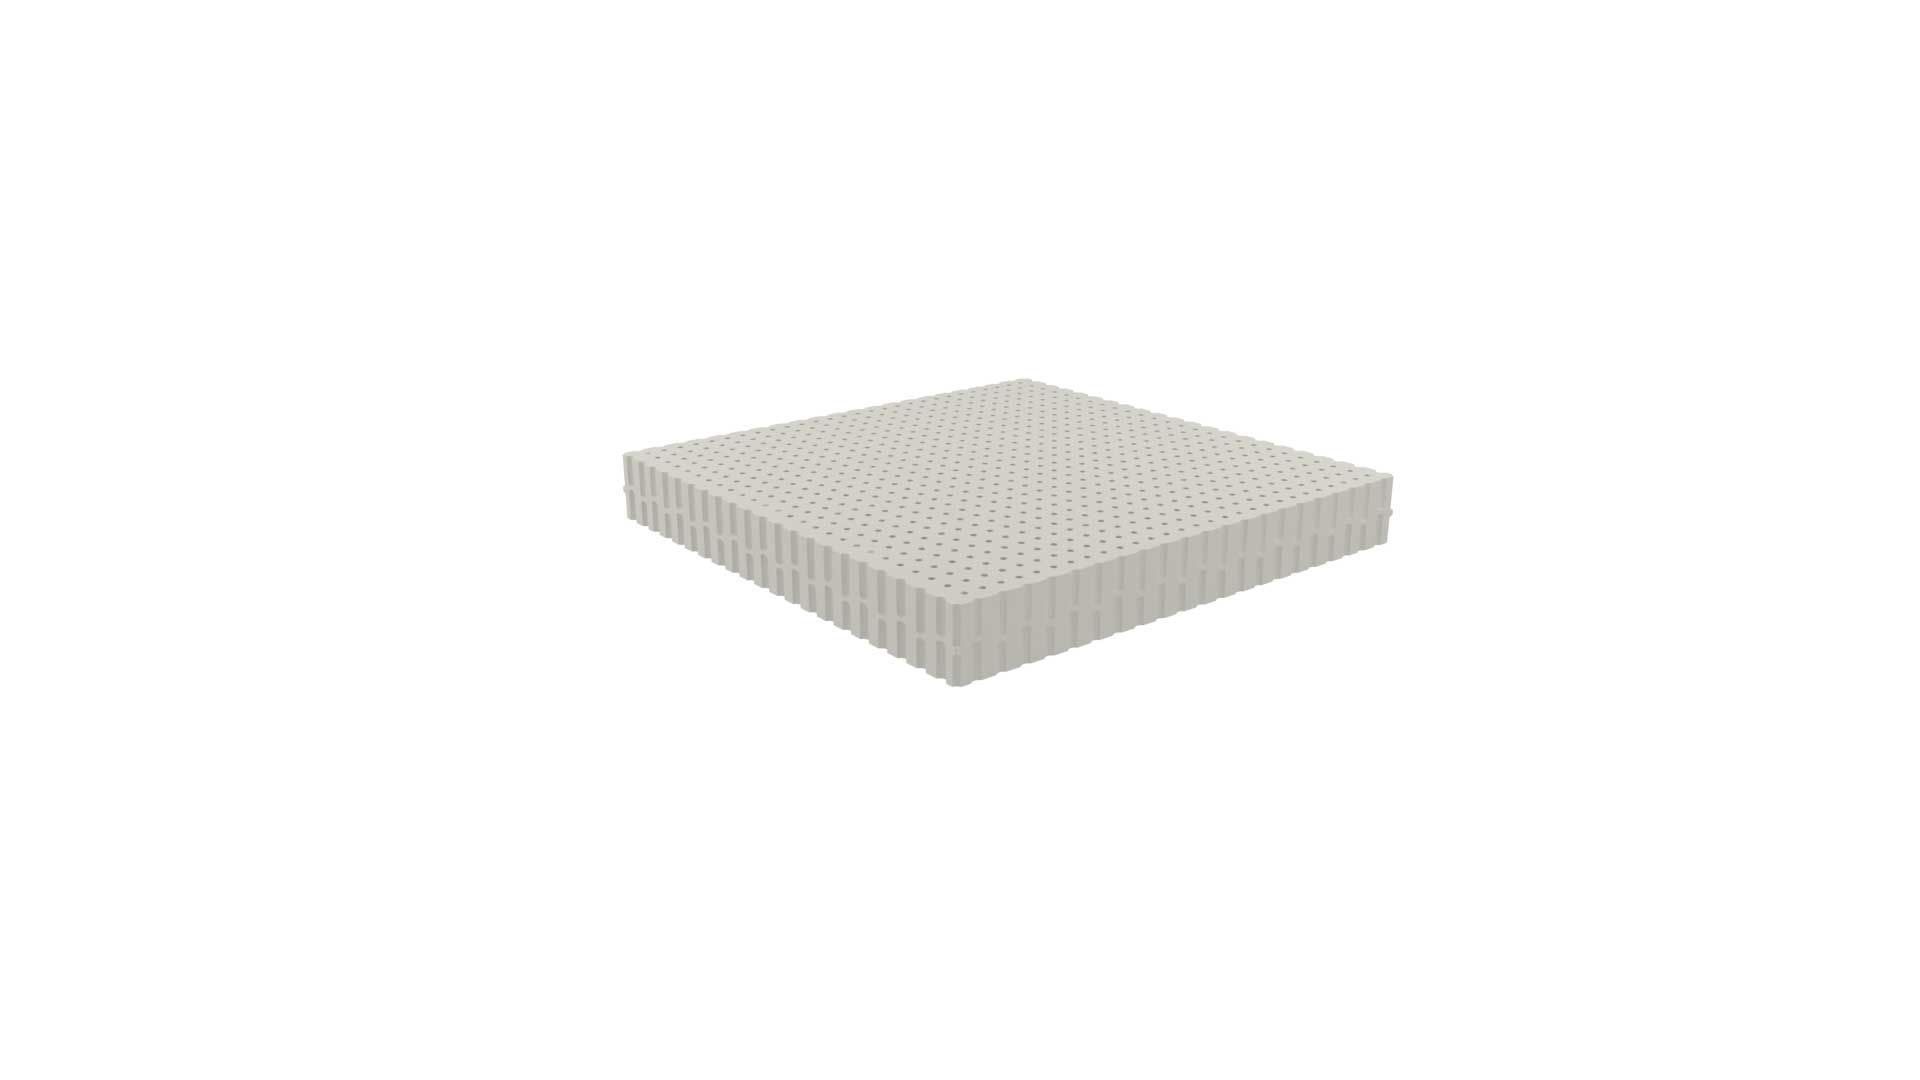 Dunlopillo Ανώστρωμα Τop Ivory, ύψους 7cm, μέτριο, από 100% φυσικό Τalalay Latex